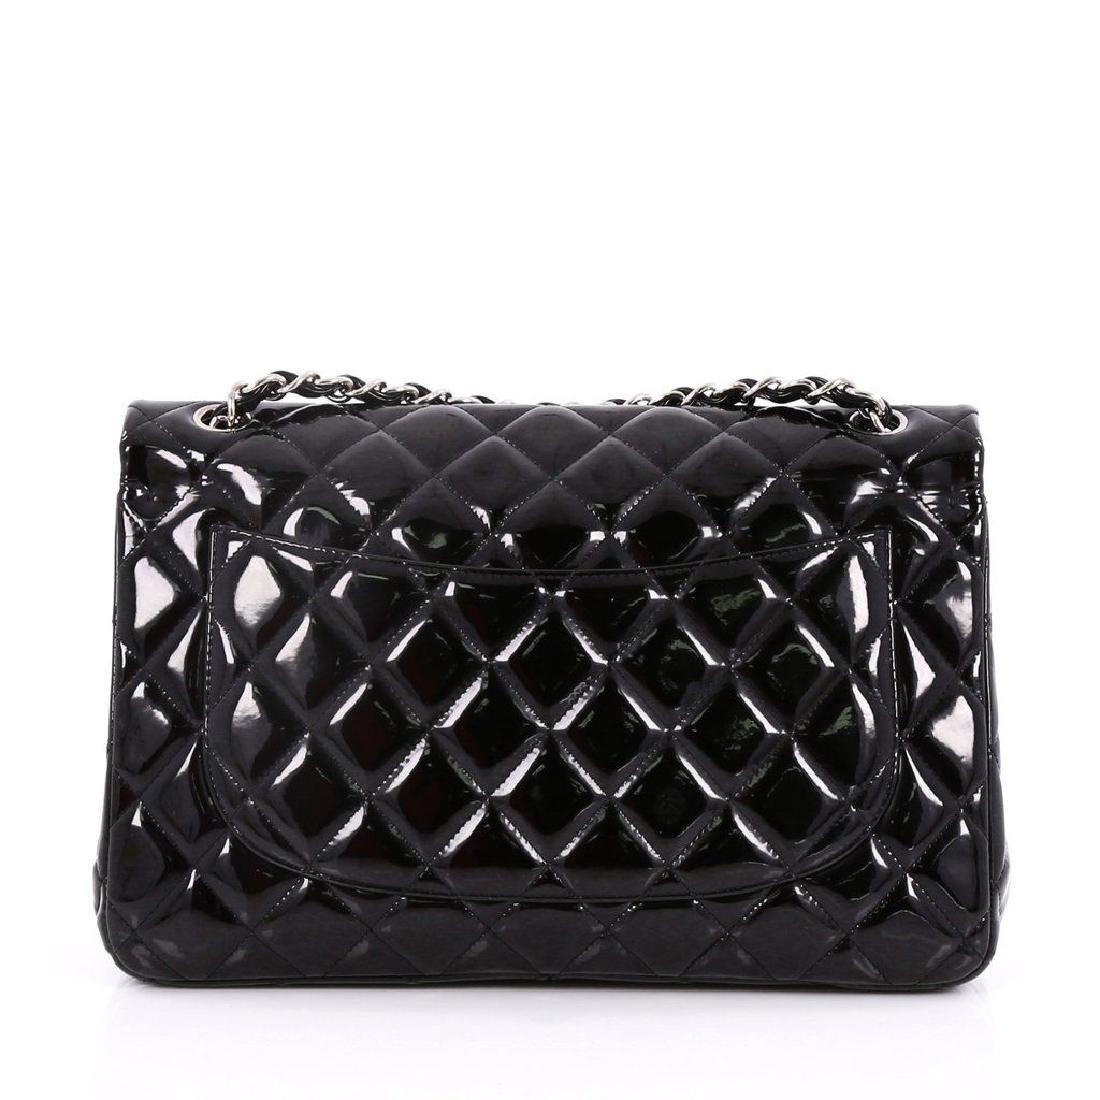 Classic Double Flap Jumbo Maxi Black Patent Leather - 3